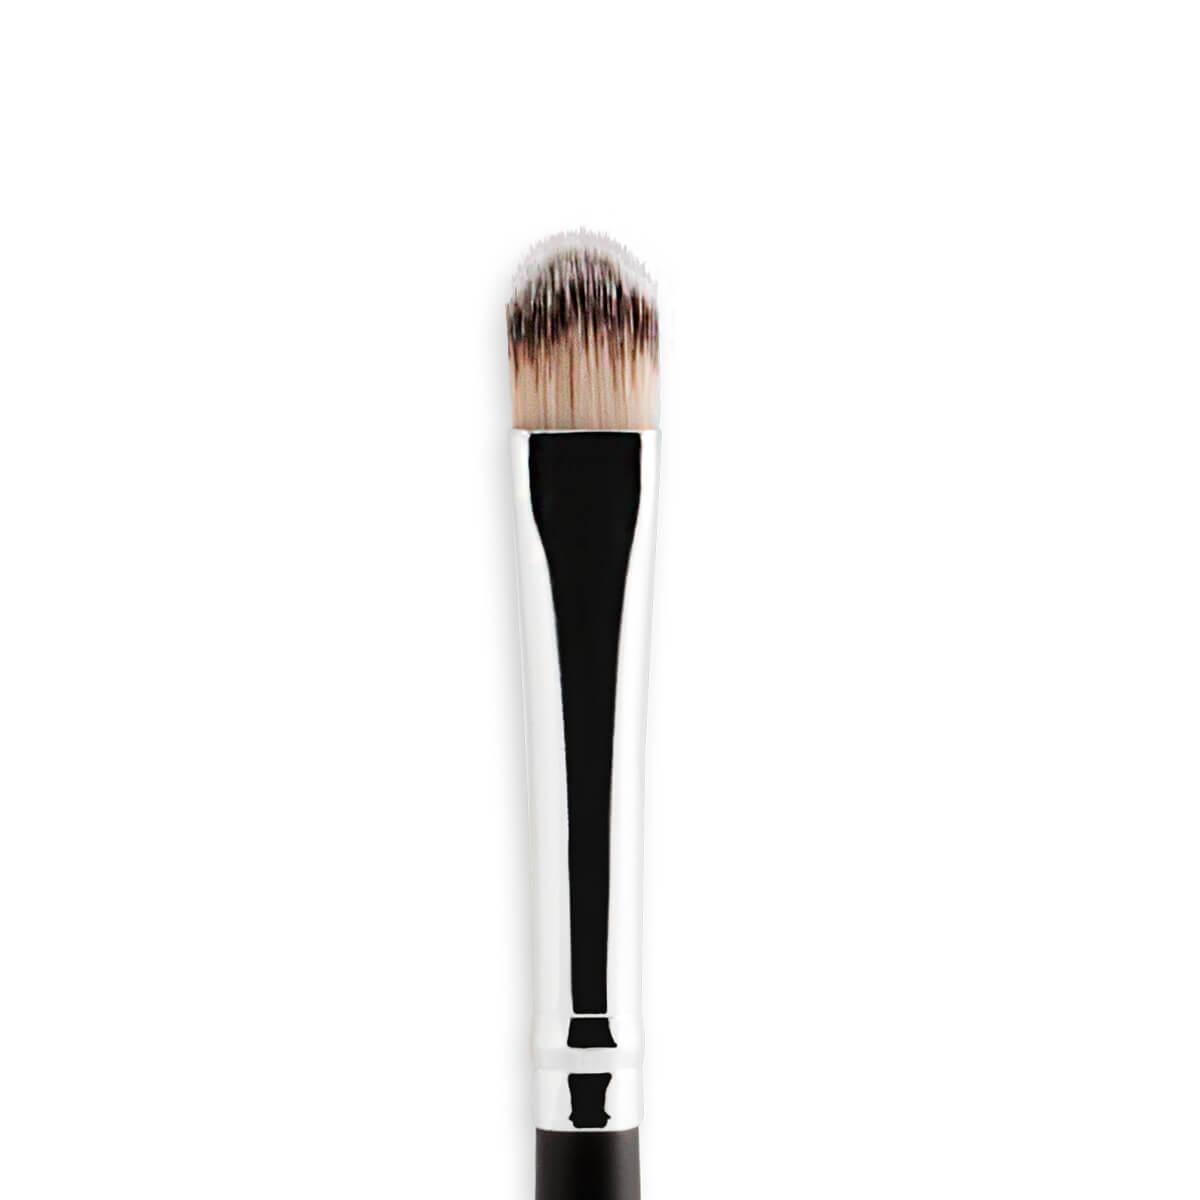 S117 - Pincel Multi Tarefas Profissional Sffumato Beauty